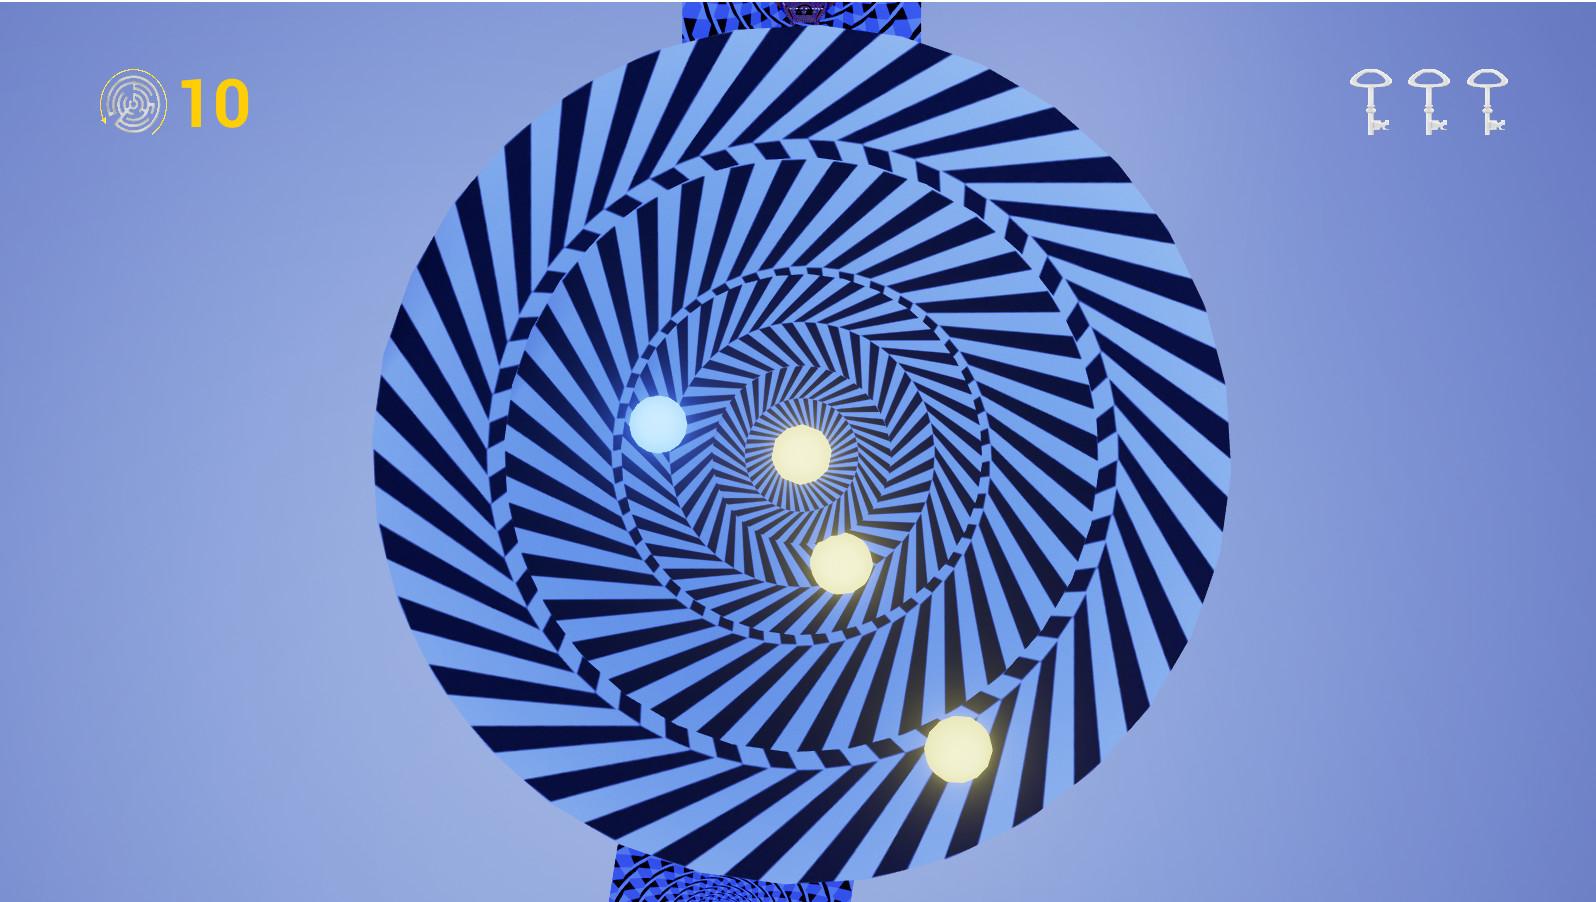 Twiddle - The Maze